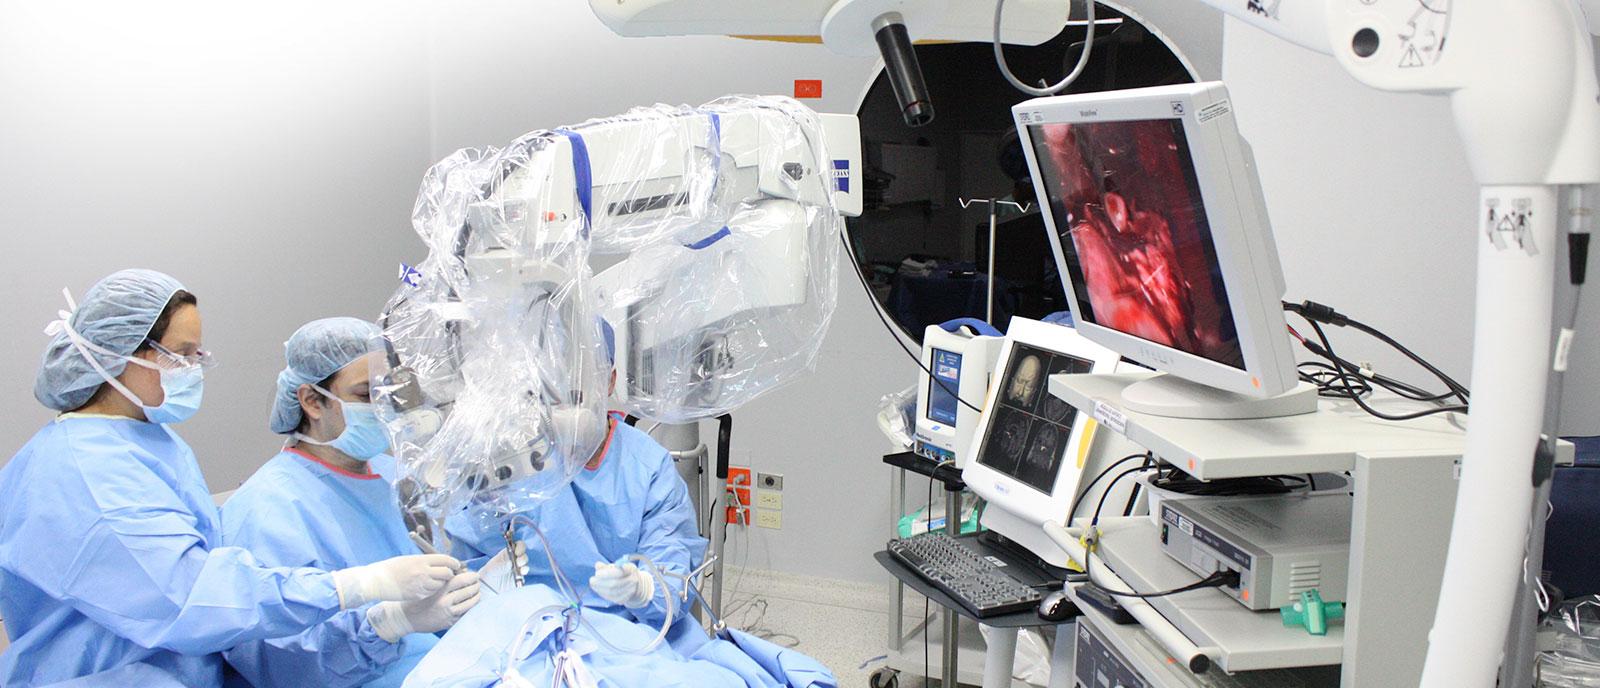 hematoma en la cabeza operacion